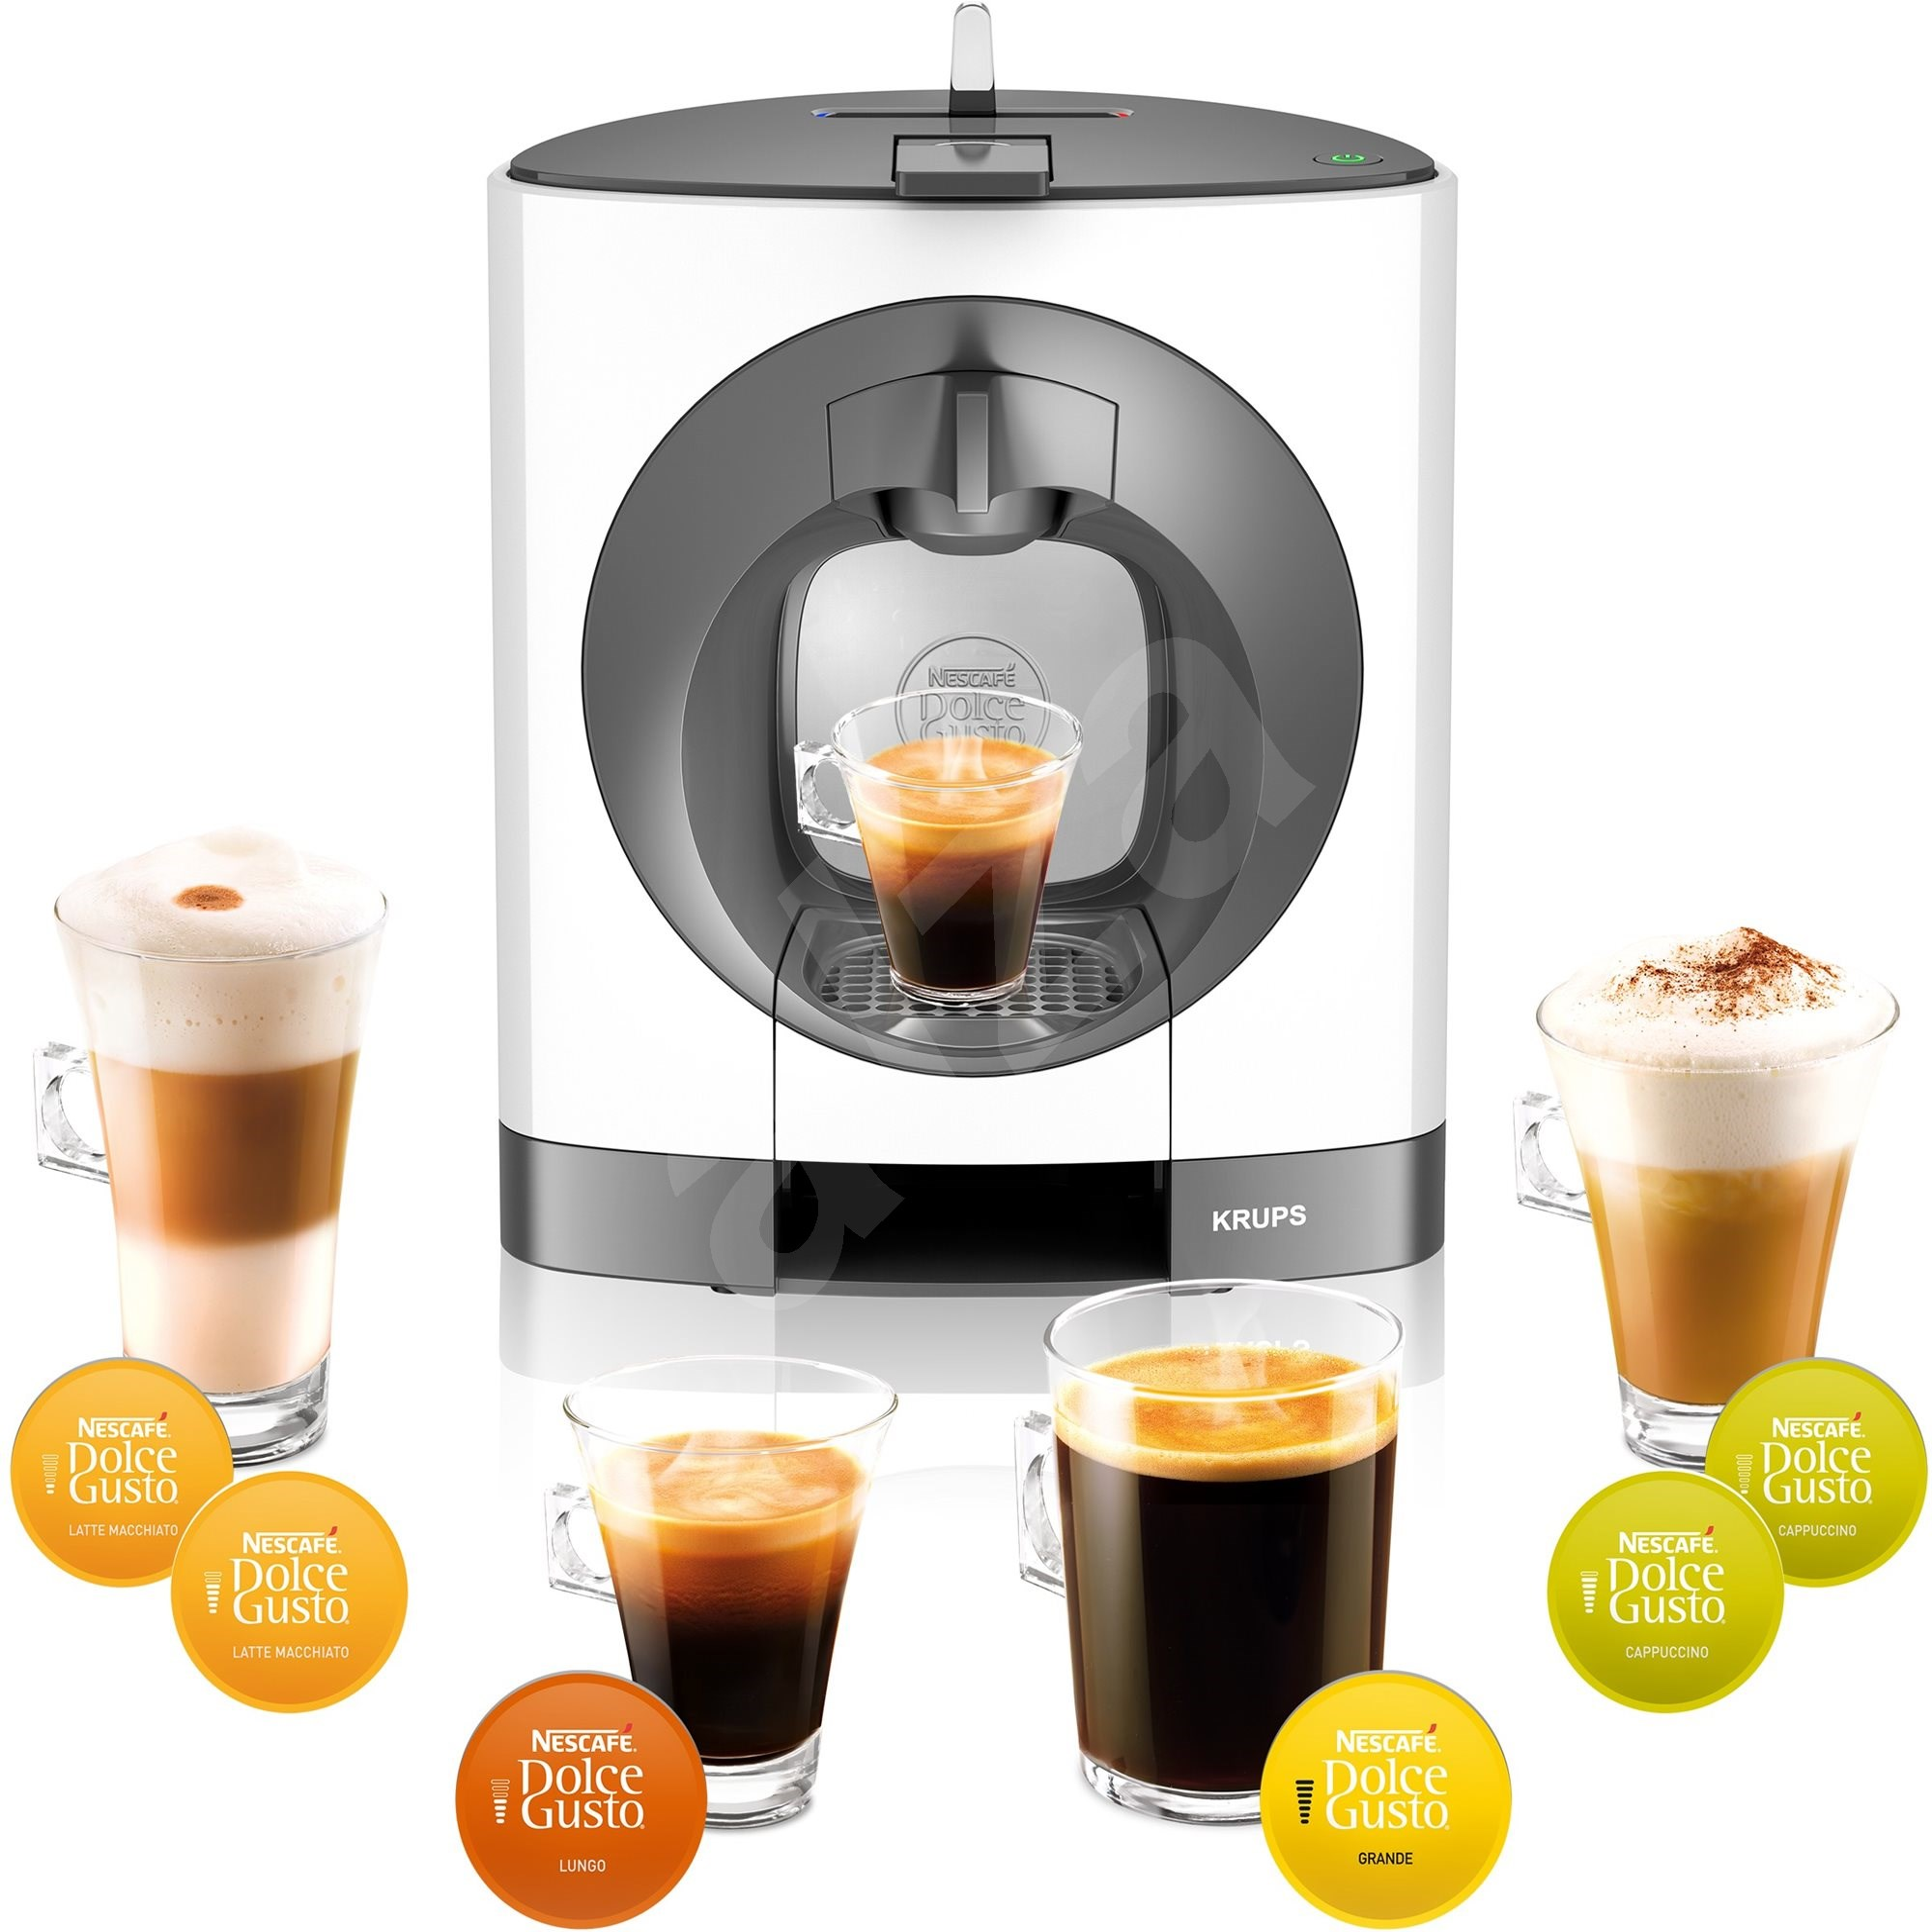 krups kp110131 nescaf dolce gusto oblo capsule coffee. Black Bedroom Furniture Sets. Home Design Ideas